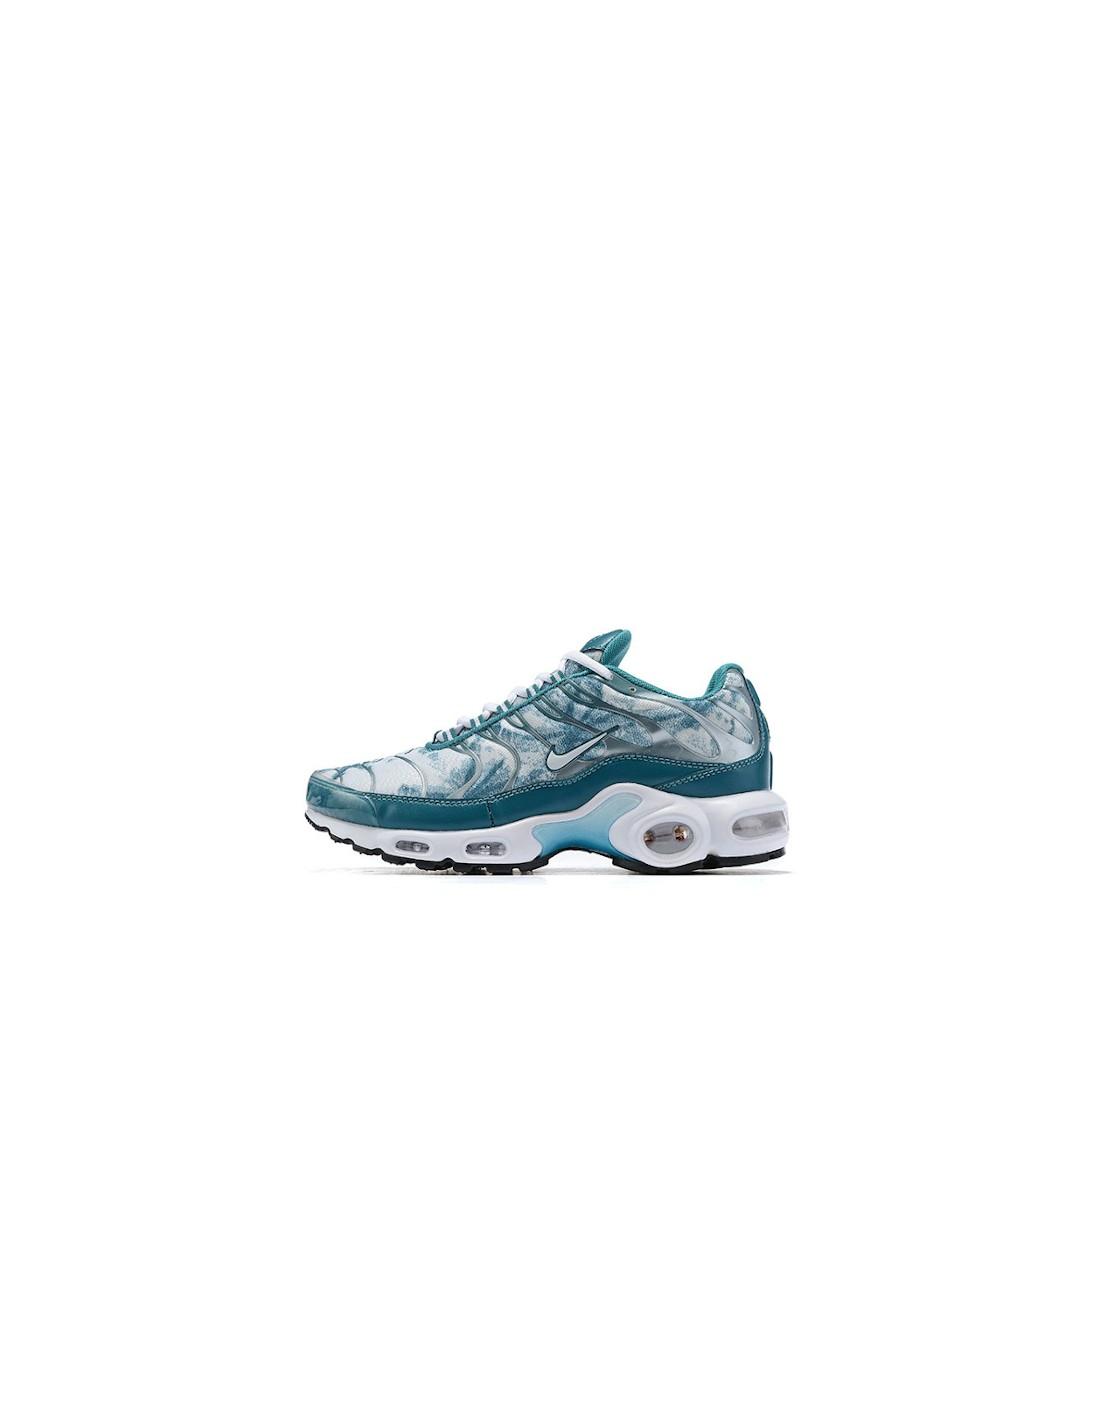 sale retailer b1e4d b73c5 Nike Air Max Plus Men's Shoe